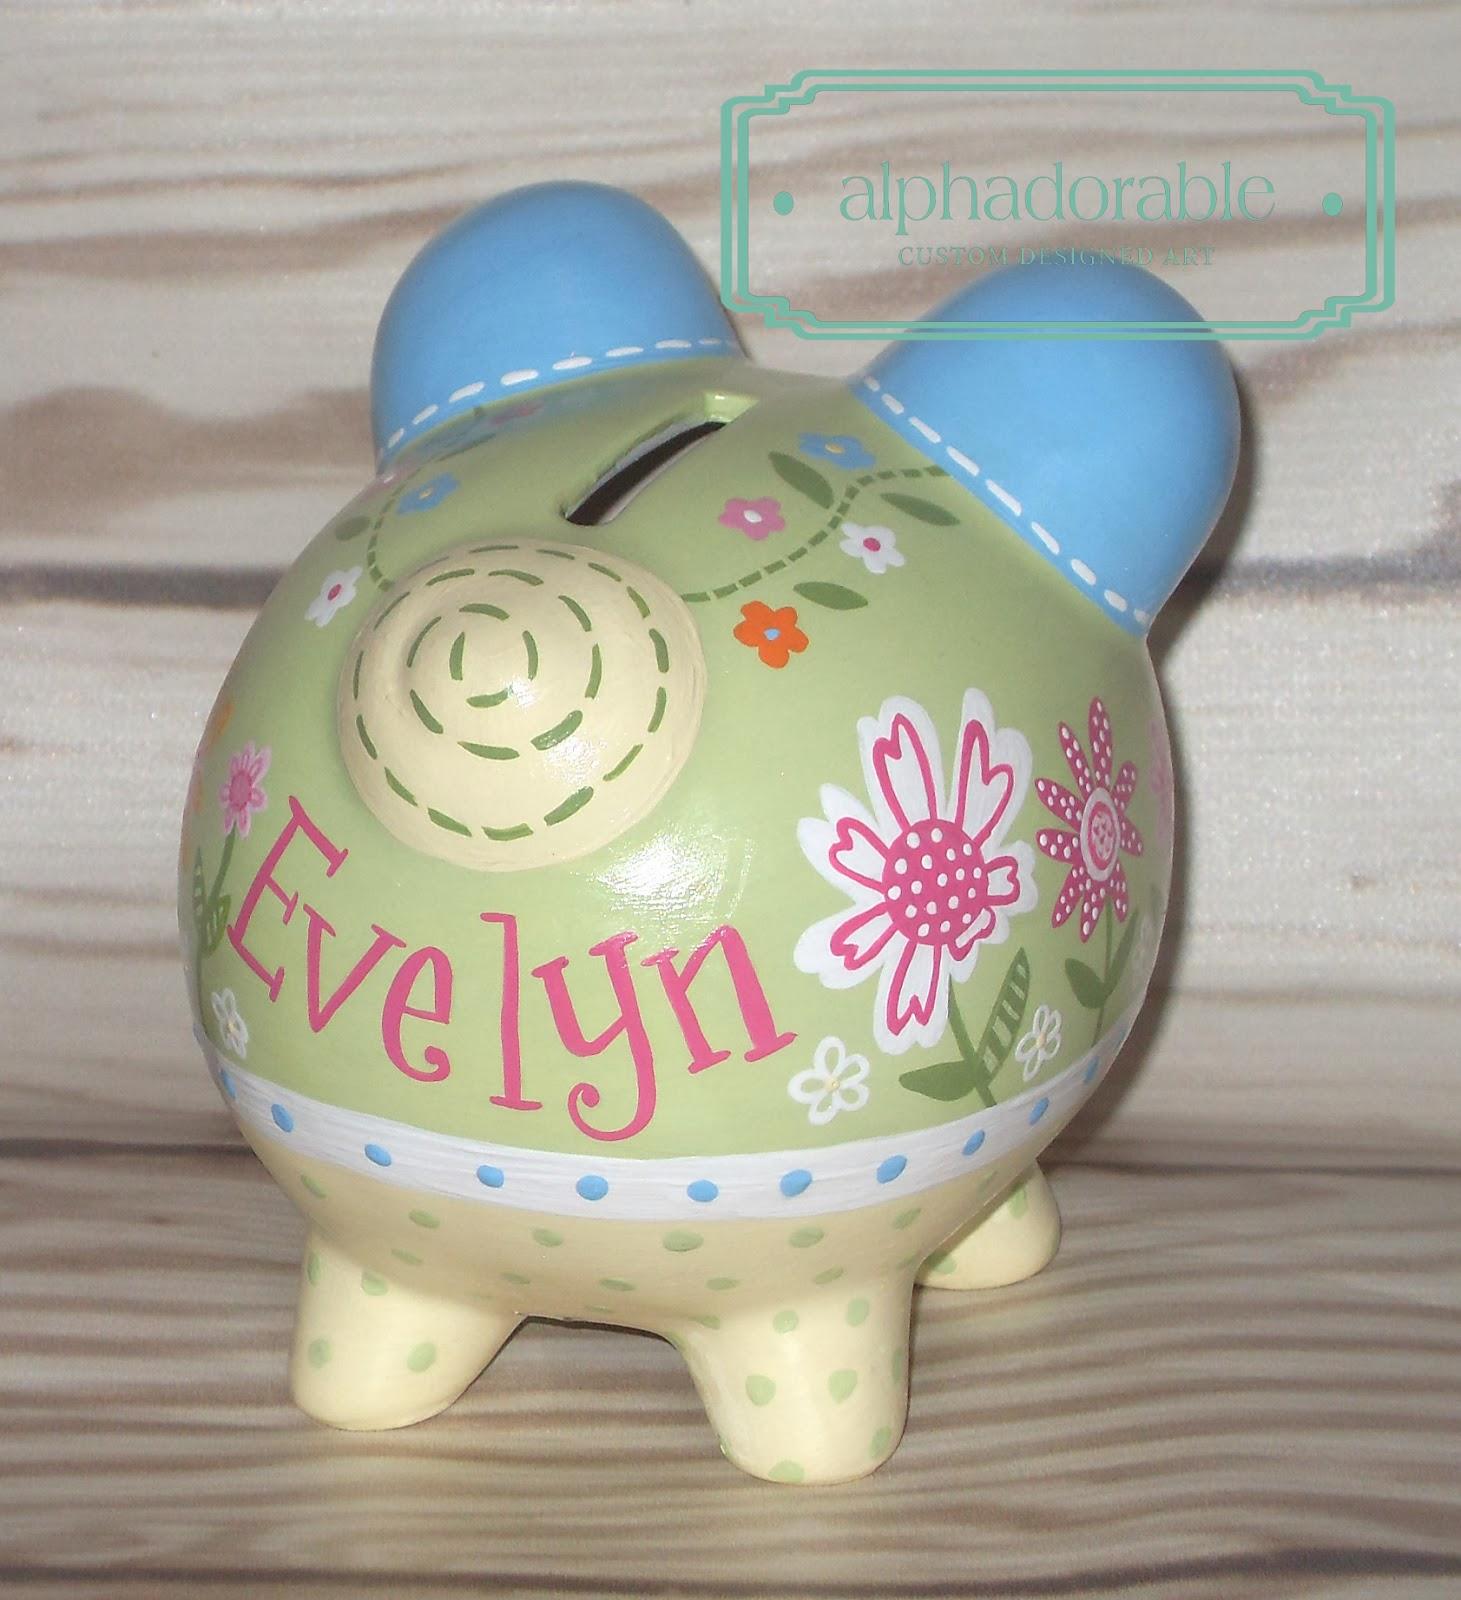 Alphadorable Custom Piggy Banks For A Daisy Garden Nursery